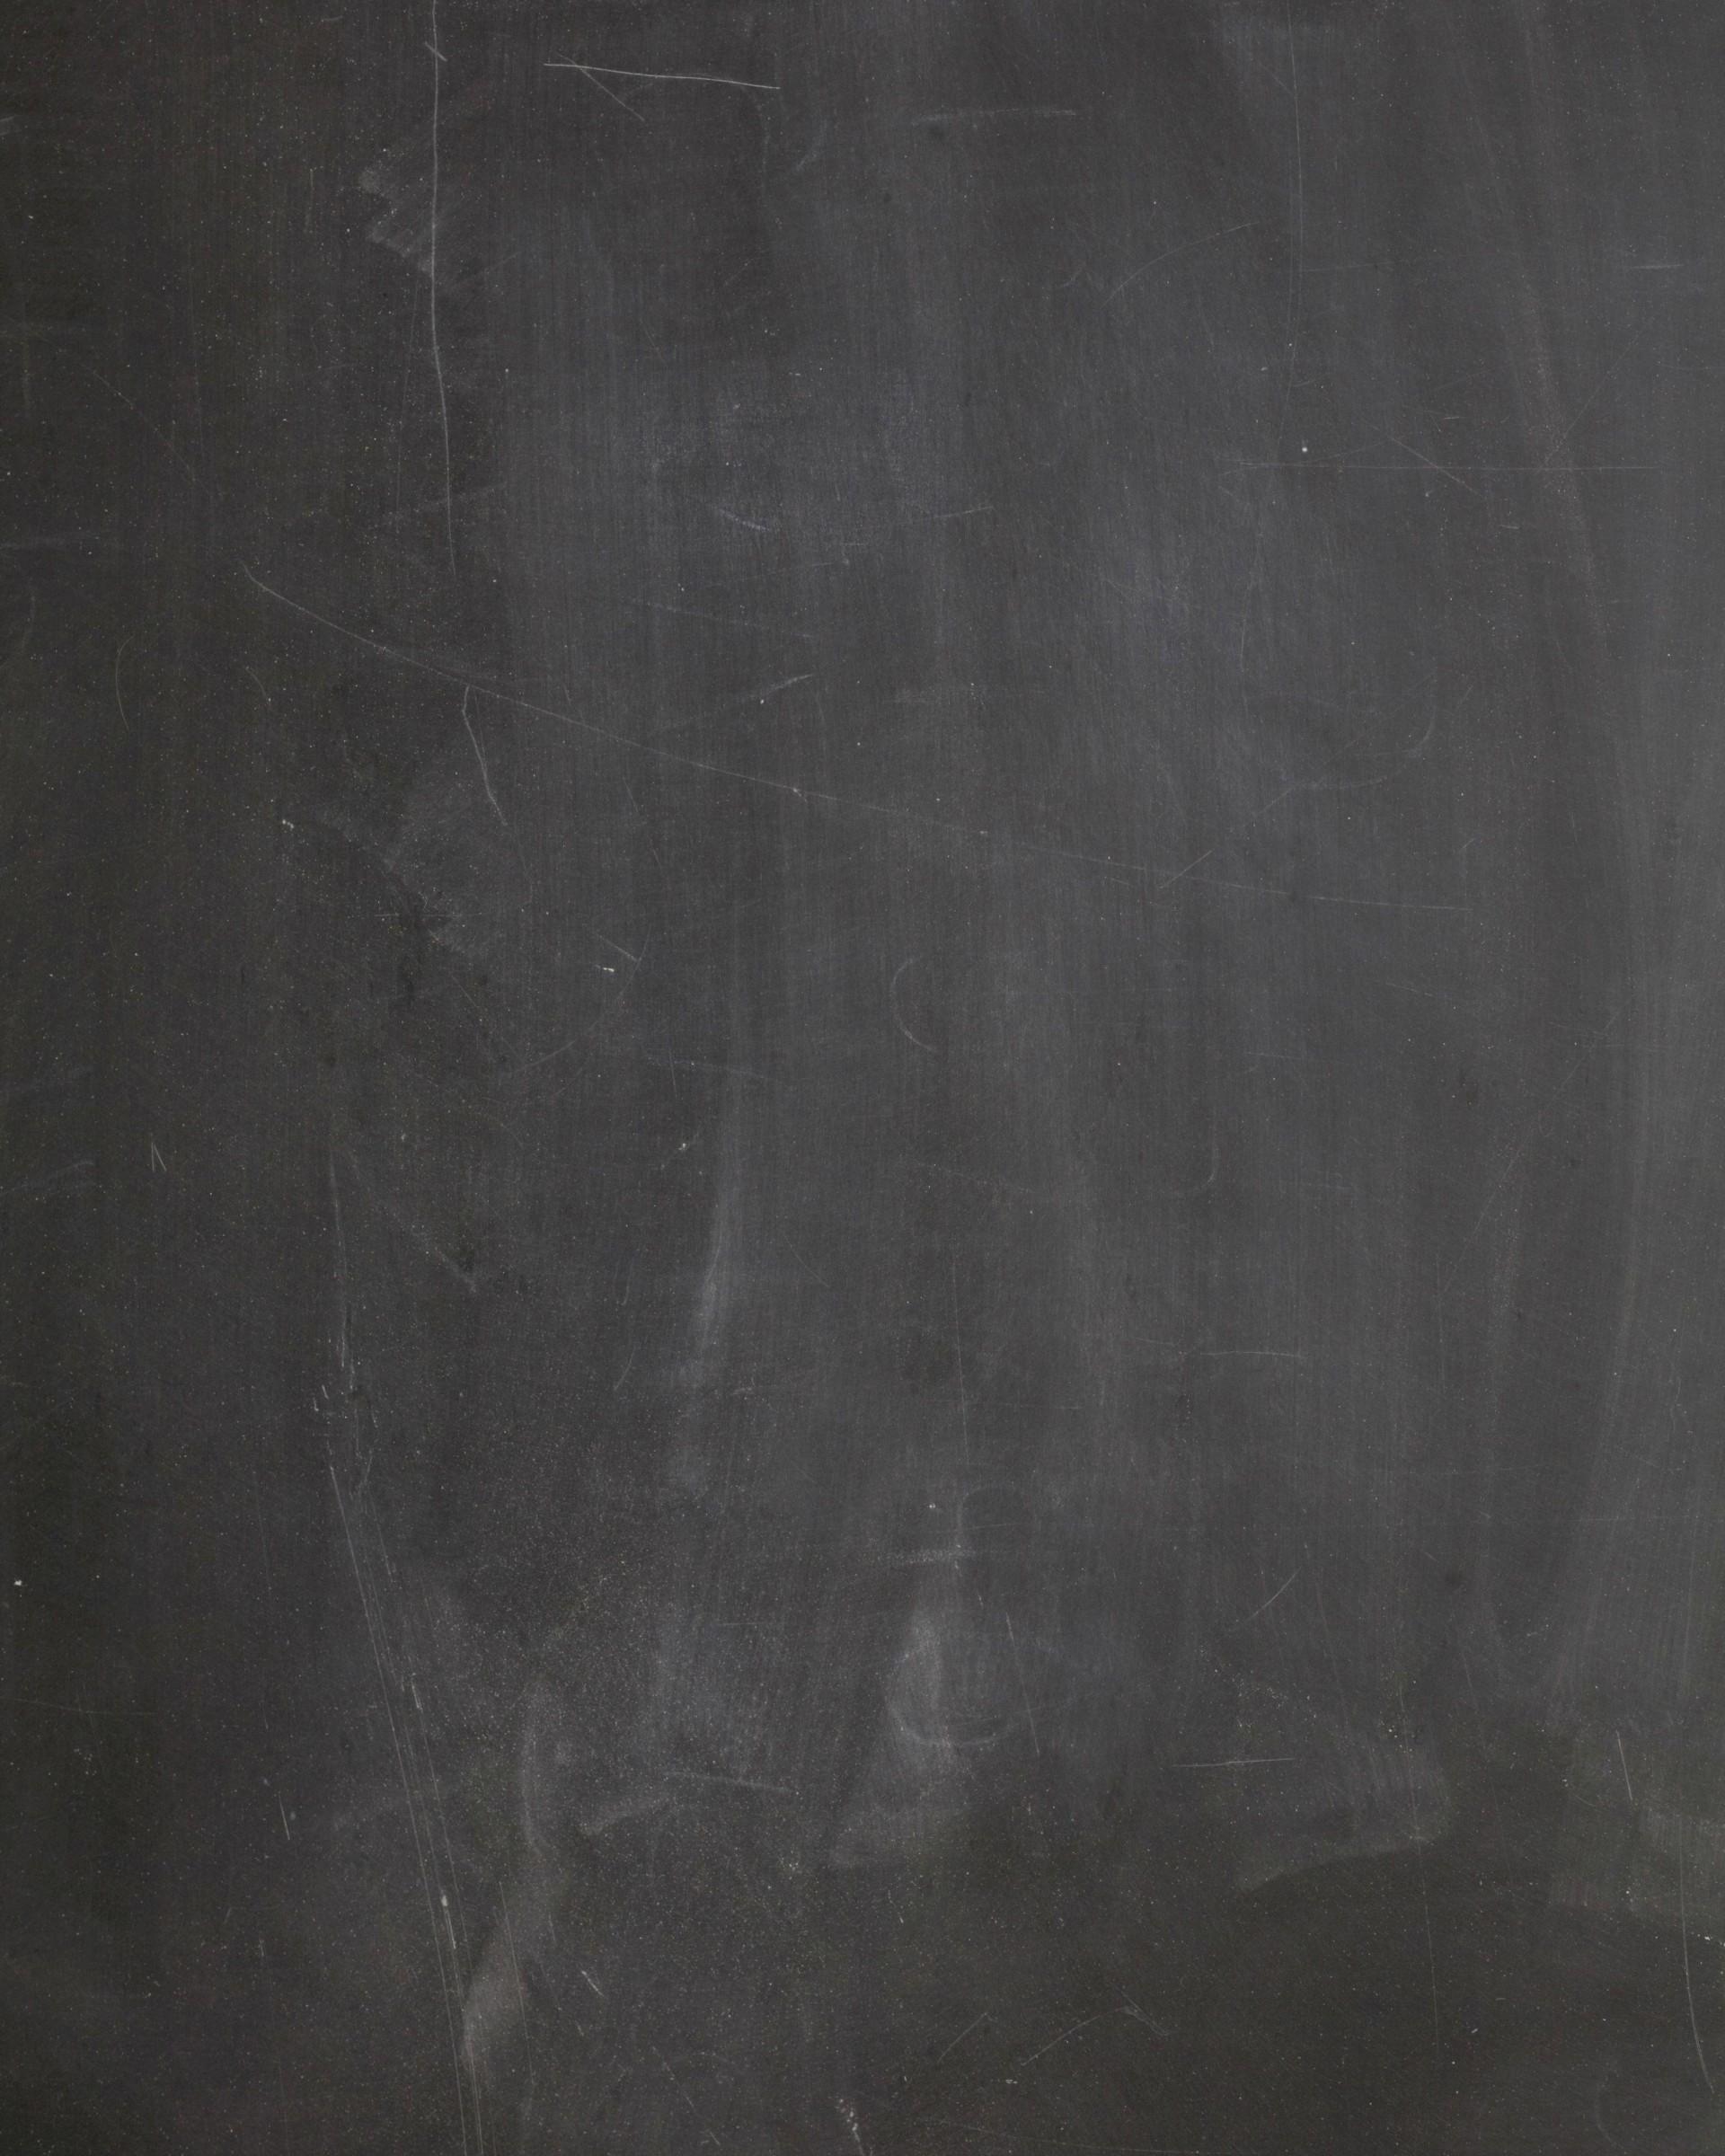 002 Awful Chalkboard Template Microsoft Word Idea  Editable Menu1920